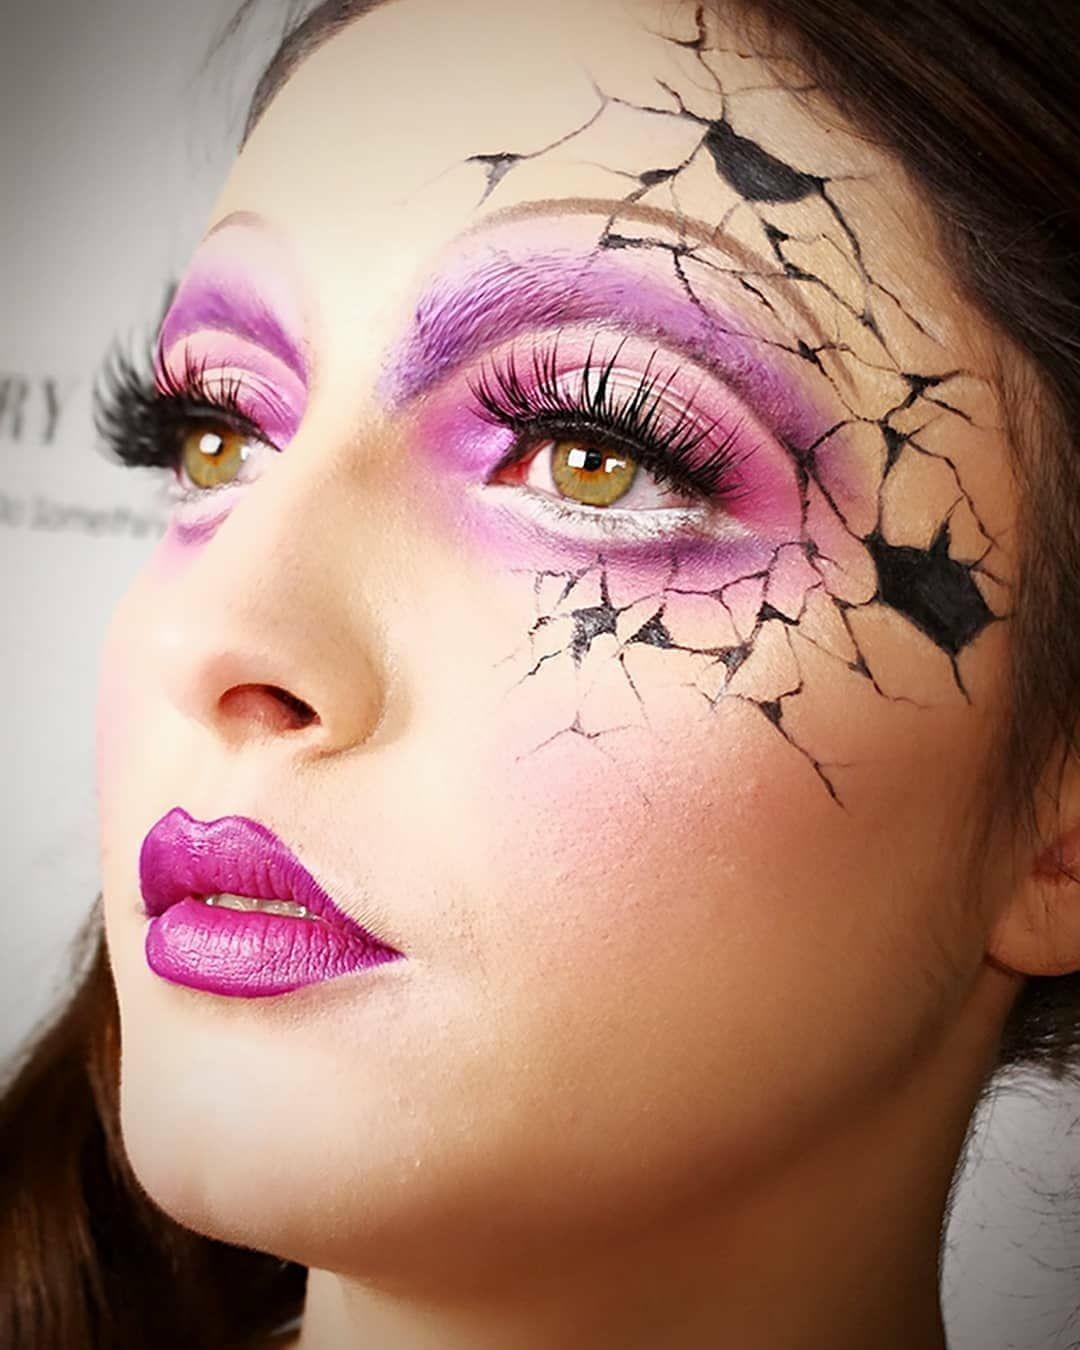 60 spooky halloween makeup ideas to set the evil mood | halloween